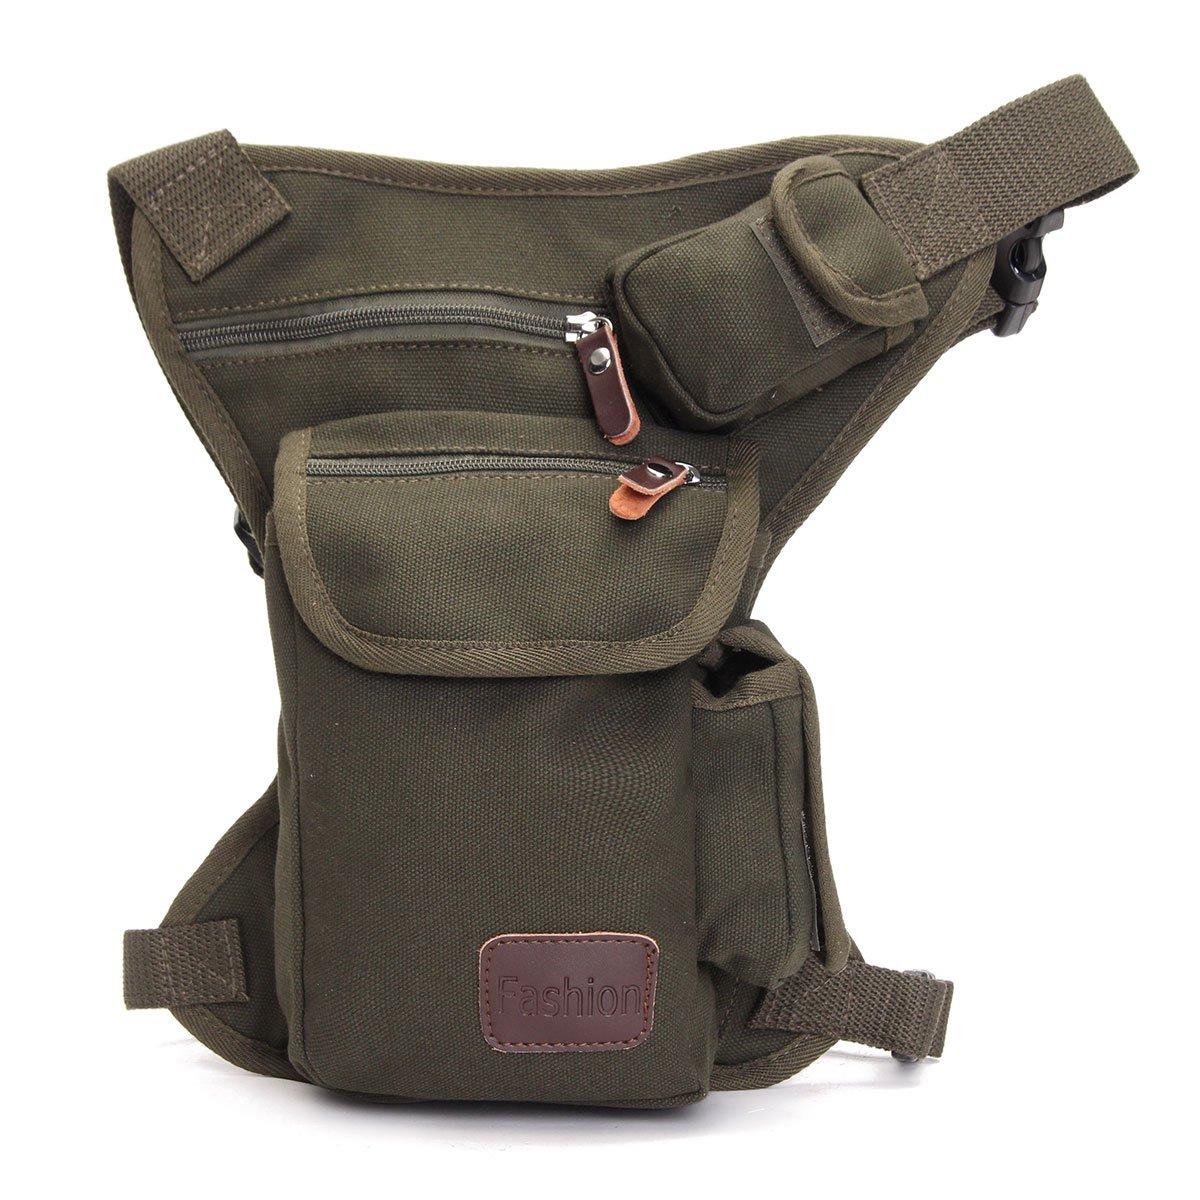 cacdb110e837 Men's Canvas Outdoor Hiking Motorcycle Riding Tactical Utility Waist Belt  Bag & Drop Leg Fanny Pack Sports Travel Canvas Tactical Army Money Belt Bag  ...